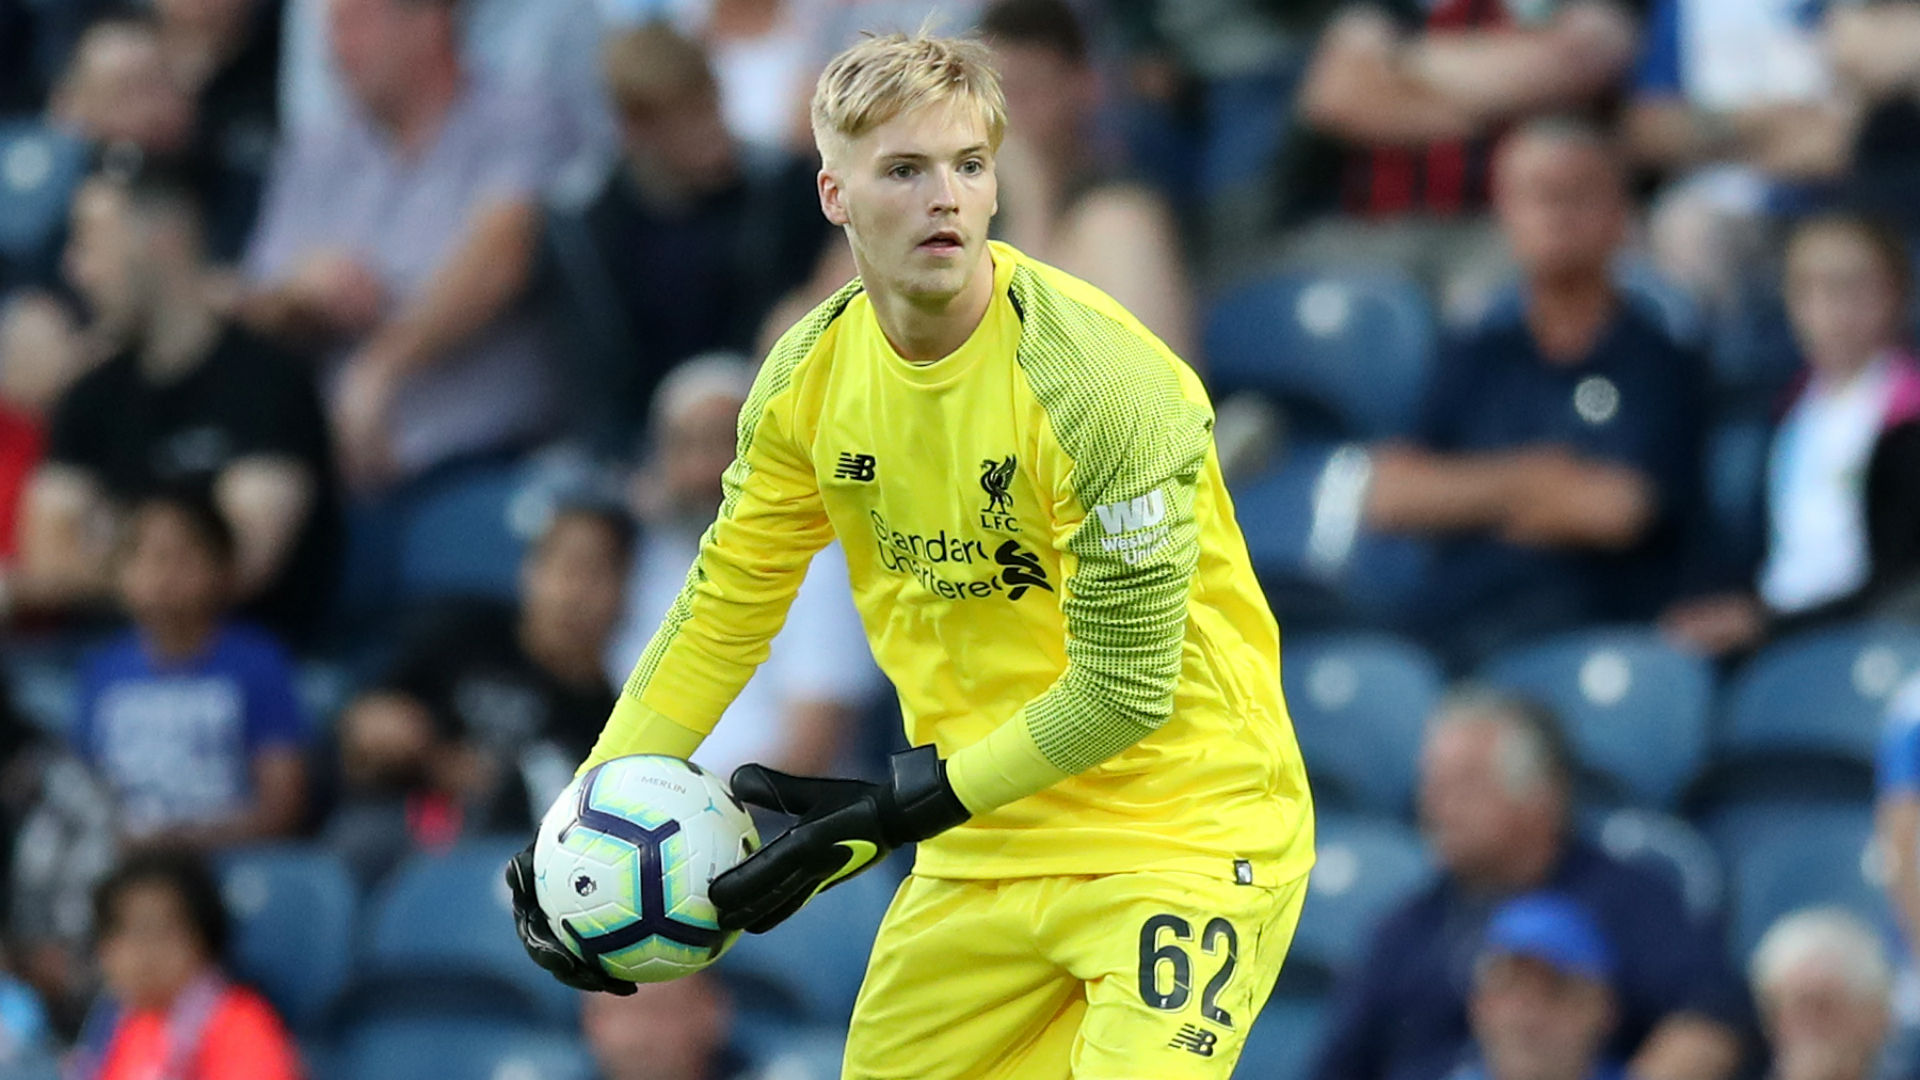 Who is Liverpool goalkeeper Caoimhin Kelleher? The Irish